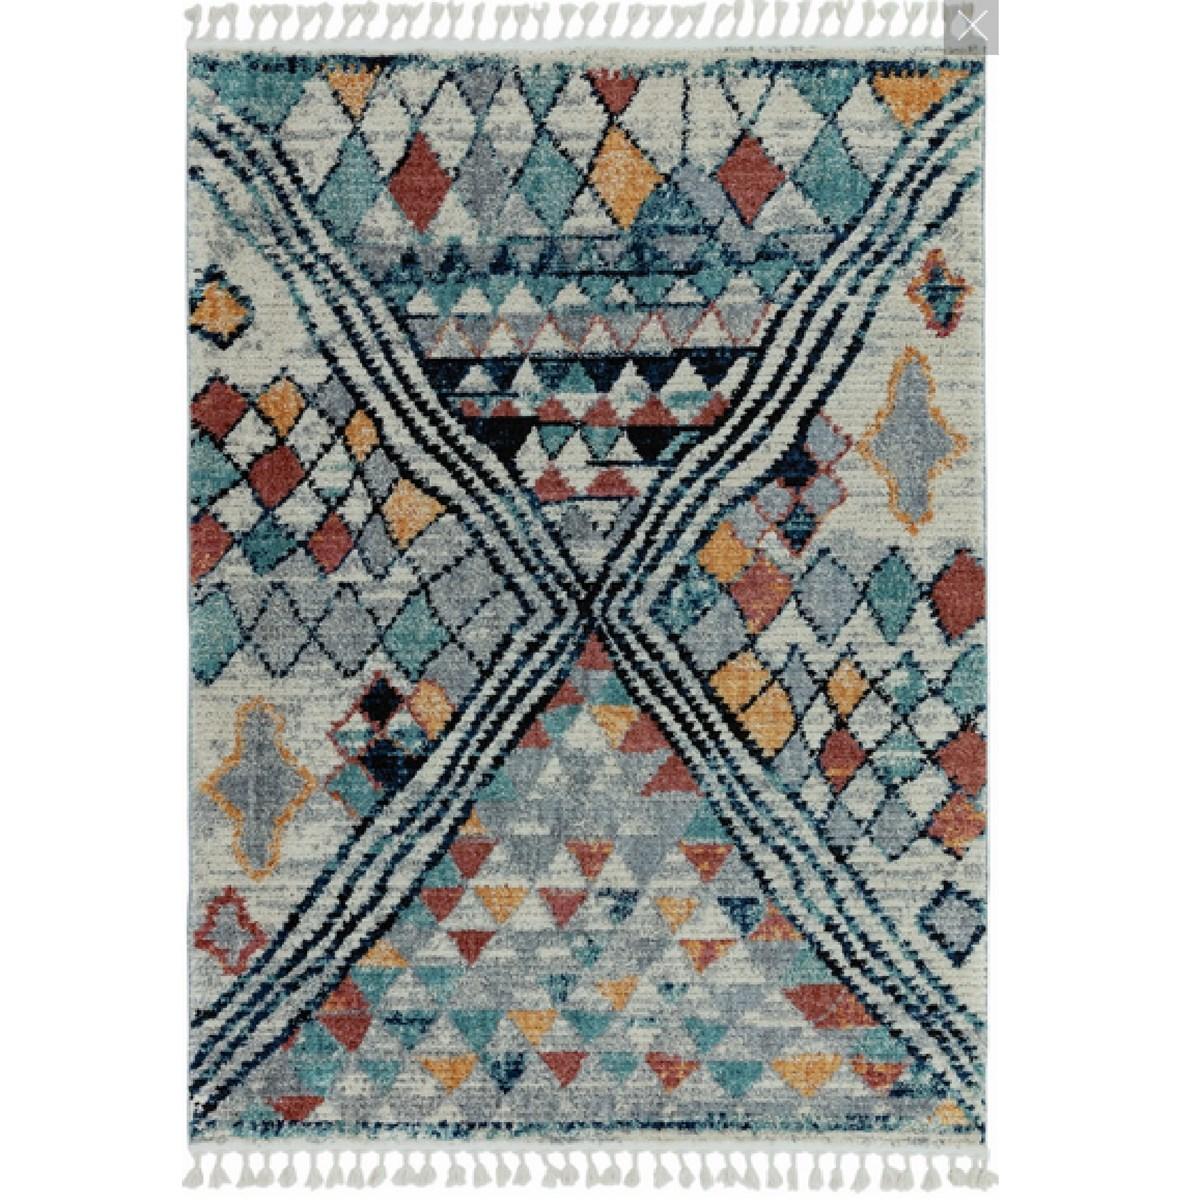 Tapis style berbère en Polyester Multicolore 200x290 cm